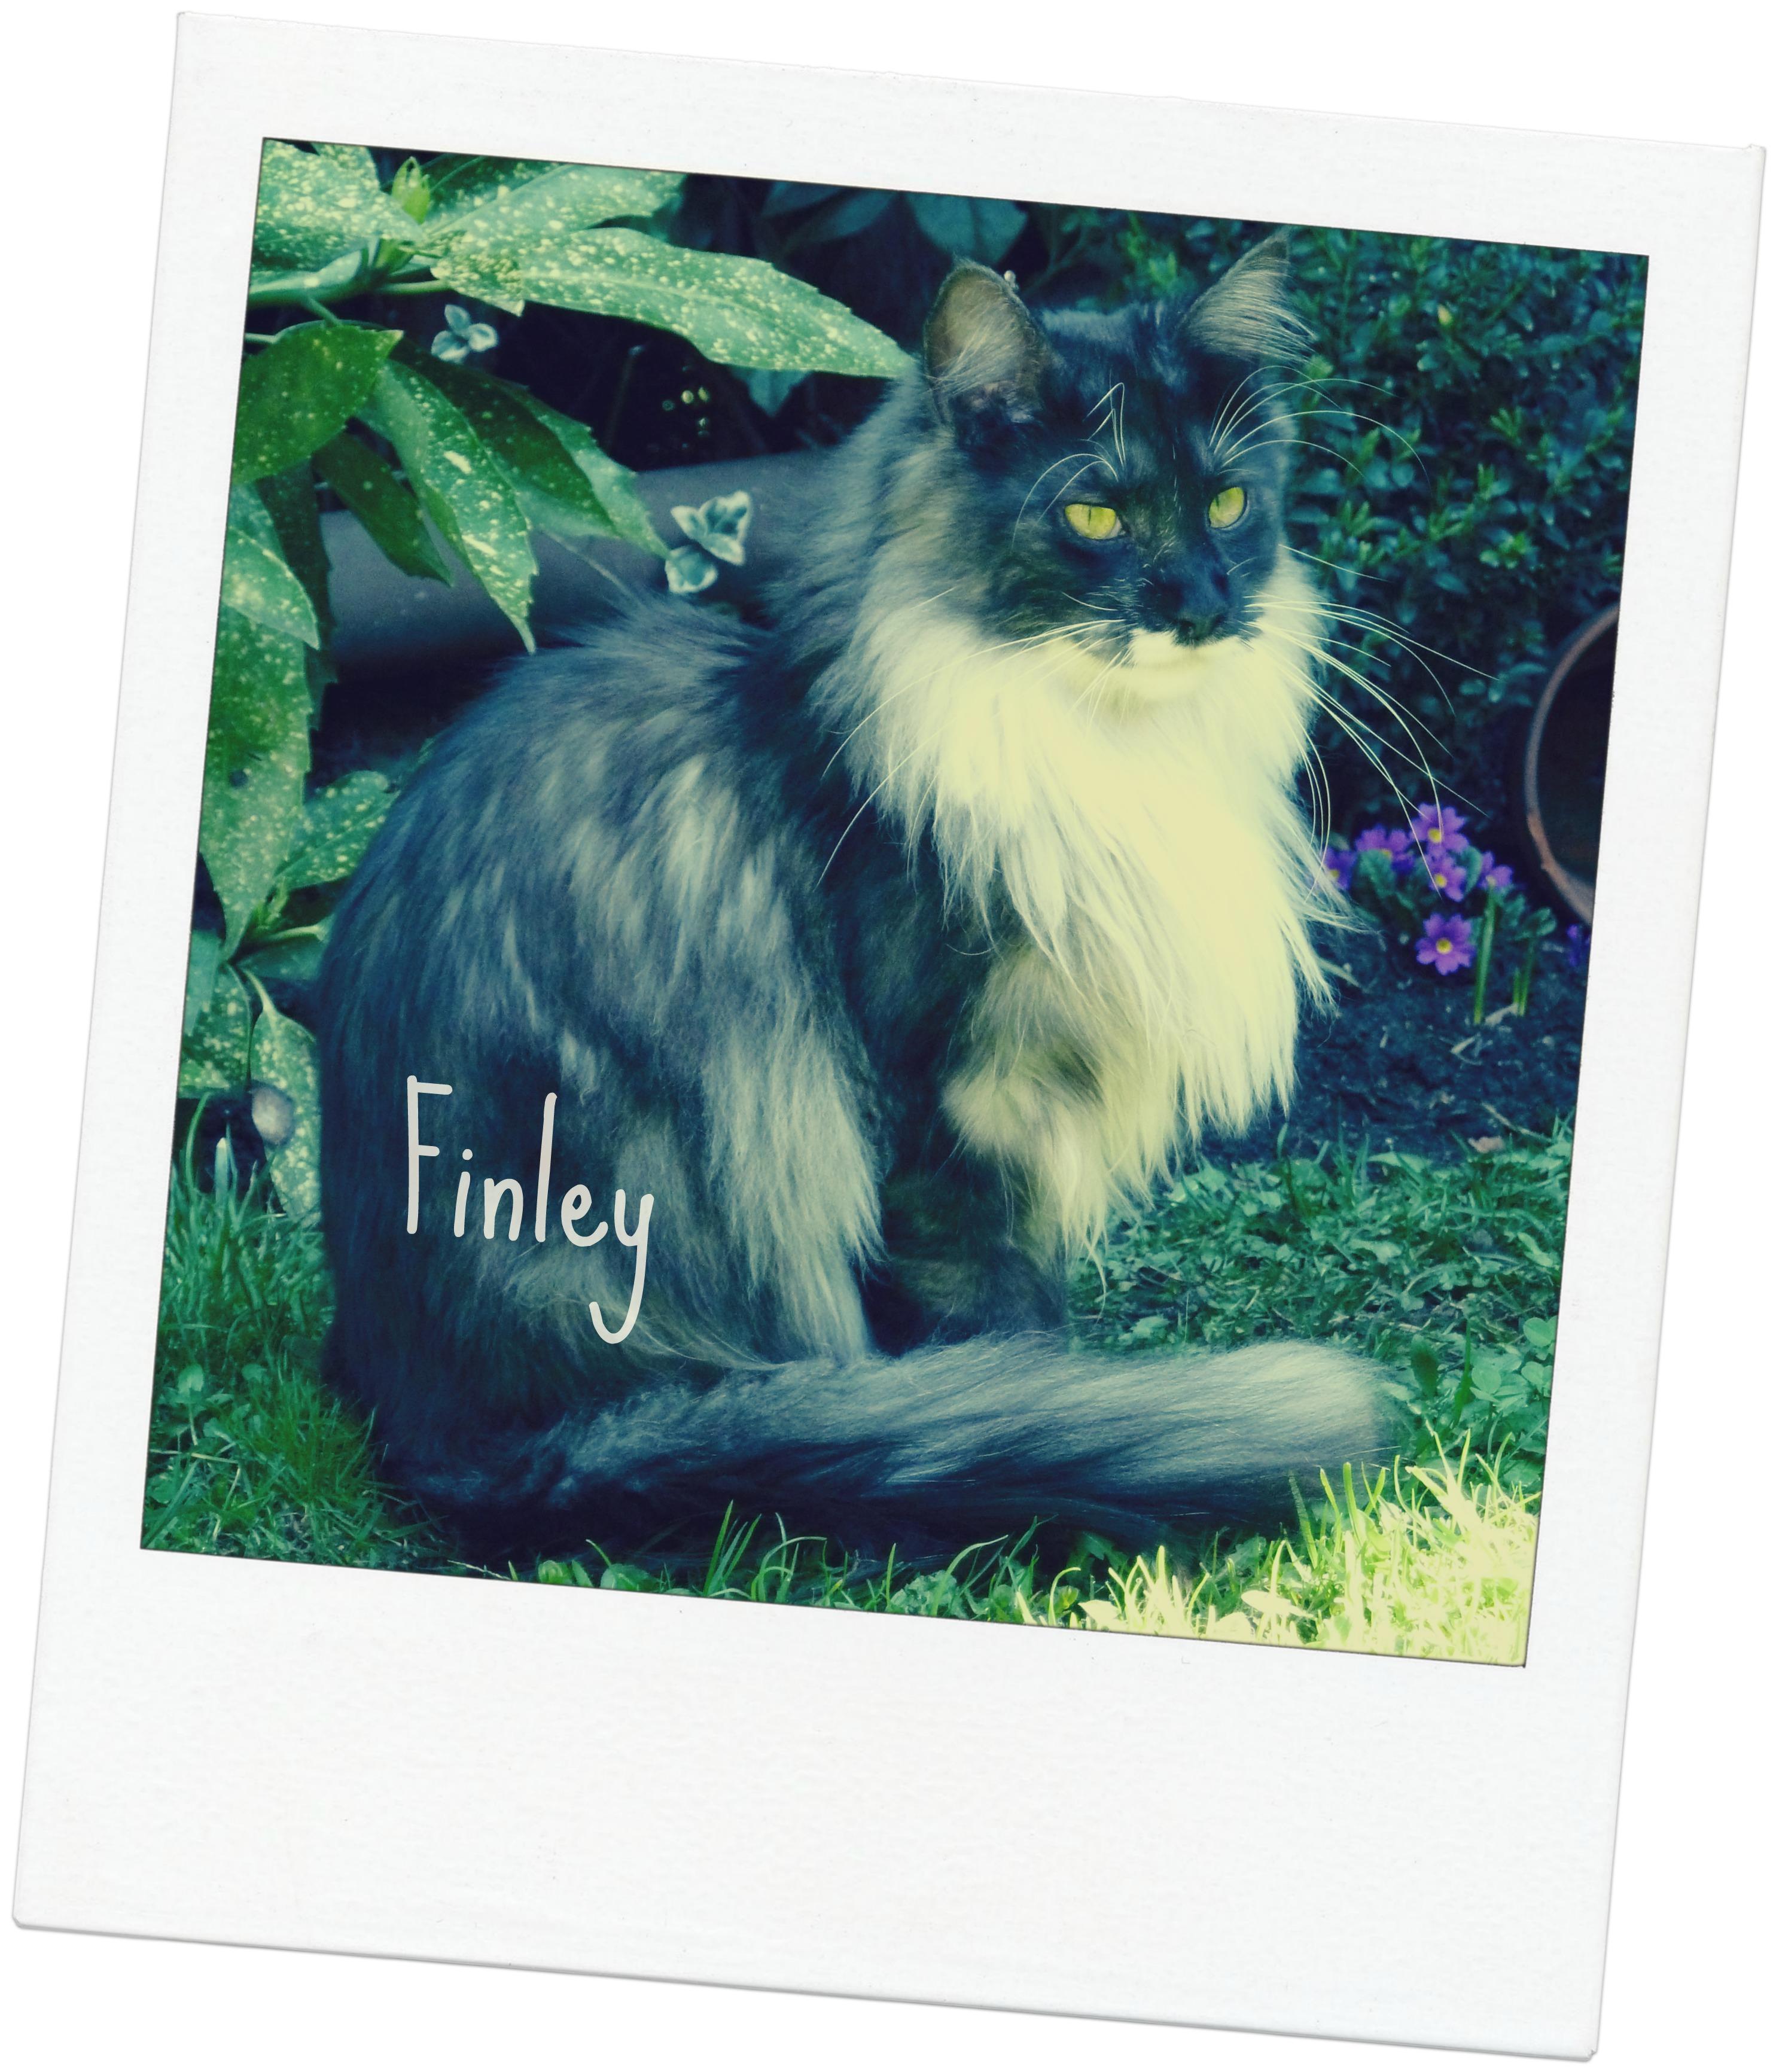 finley blog